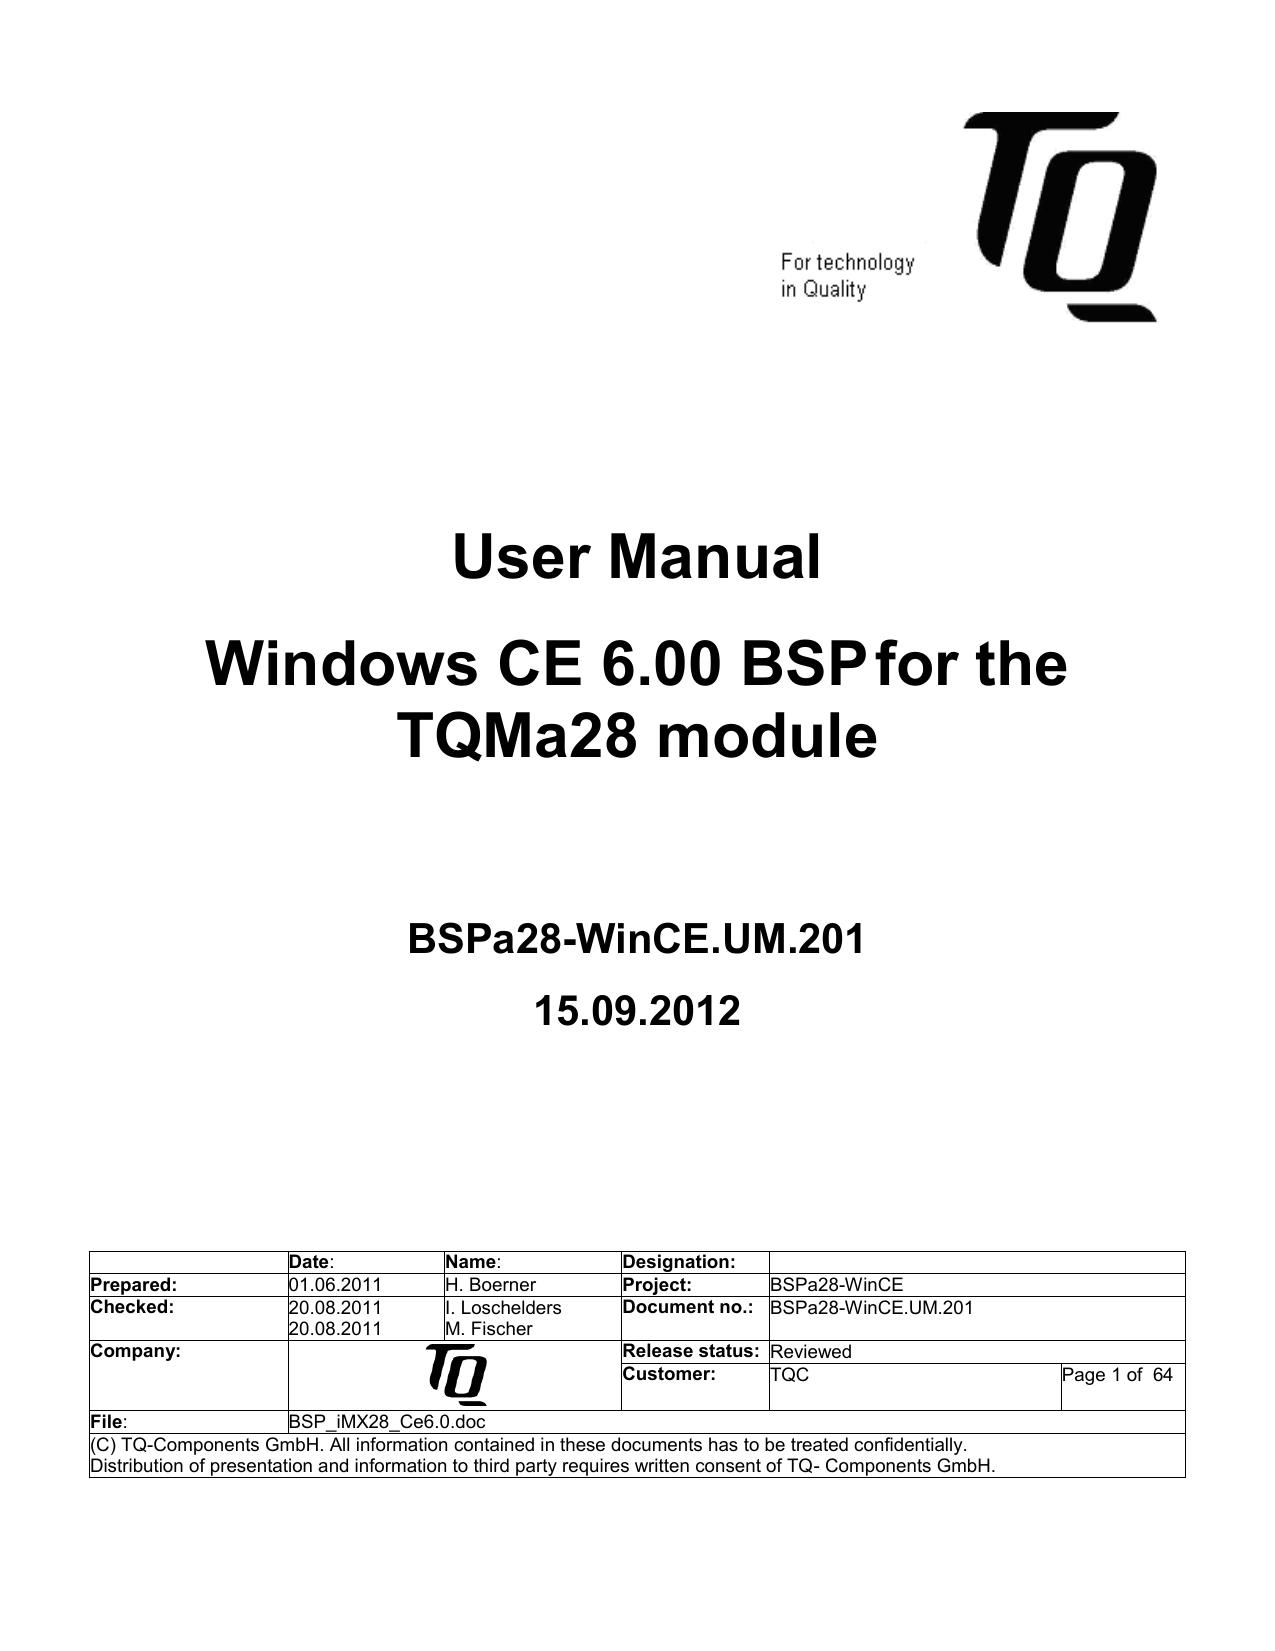 Symbol usb activesync rndis driver windows 7 64 bit